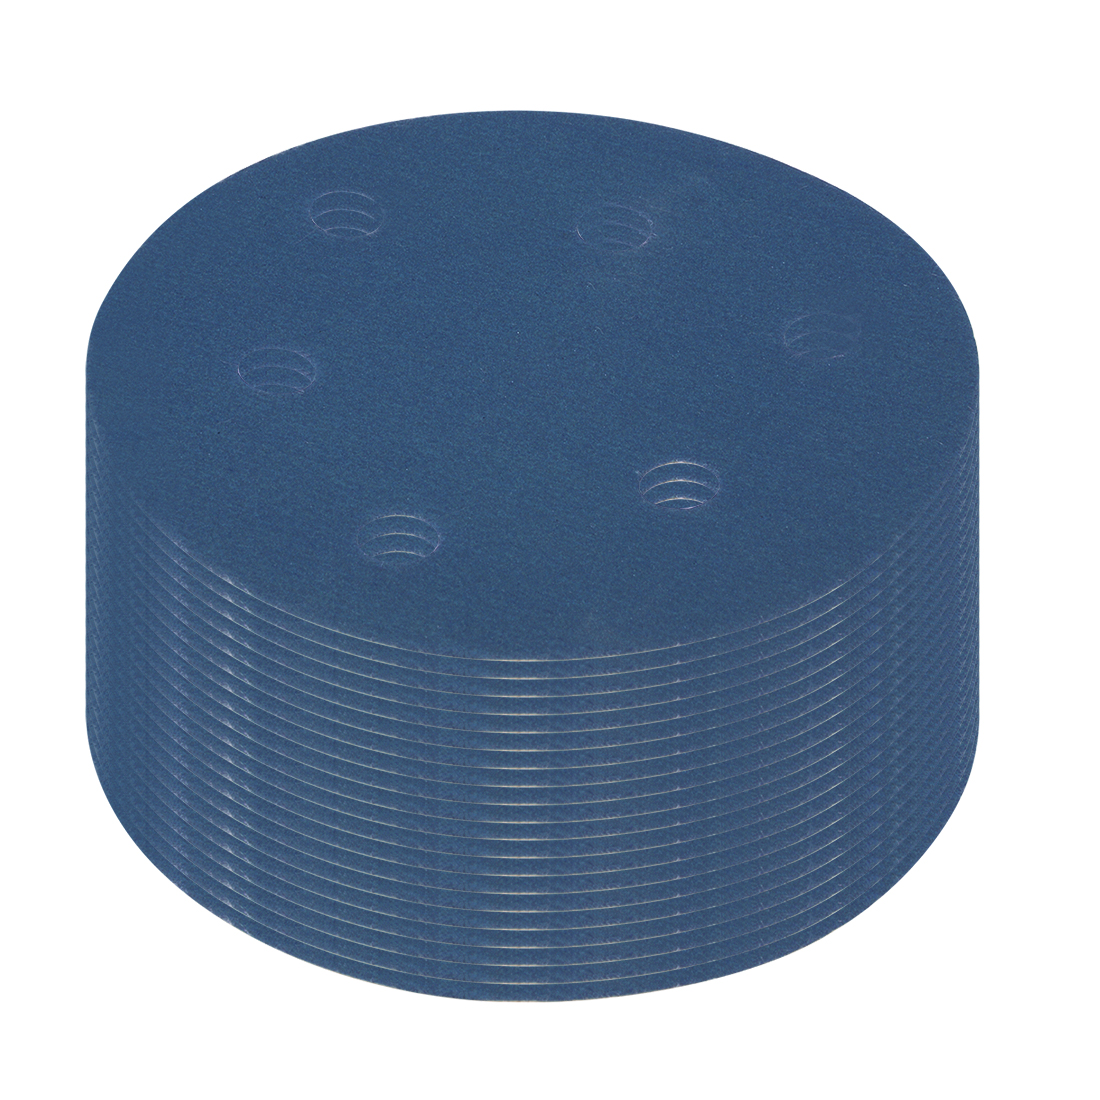 Uxcell 20 Pcs 5 Inch 6 Hole Hook And Loop Sanding Disc 600 Grits Flocking Sandpaper Random Orbital Sander Paper